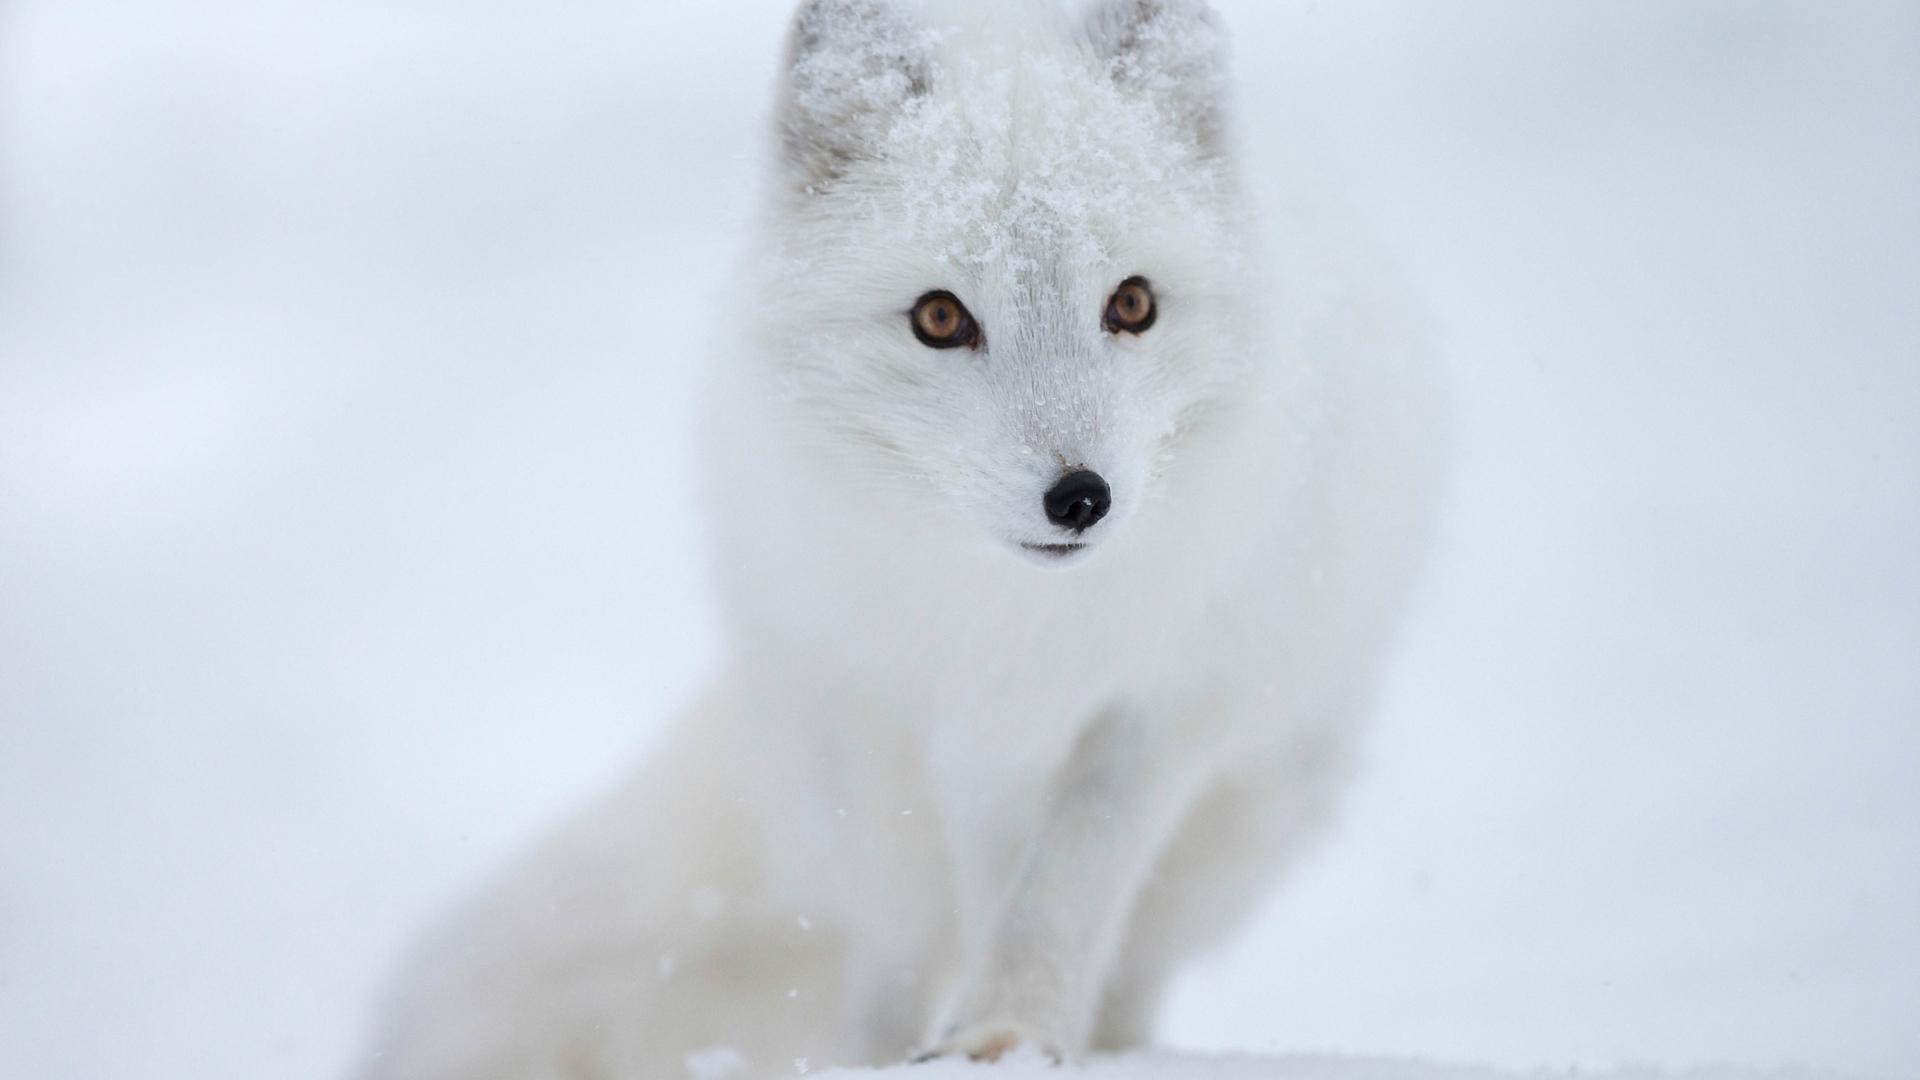 Cute Cartoon Foxes Wallpaper White Fox In The Snow Hd Wild Animal Wallpaper